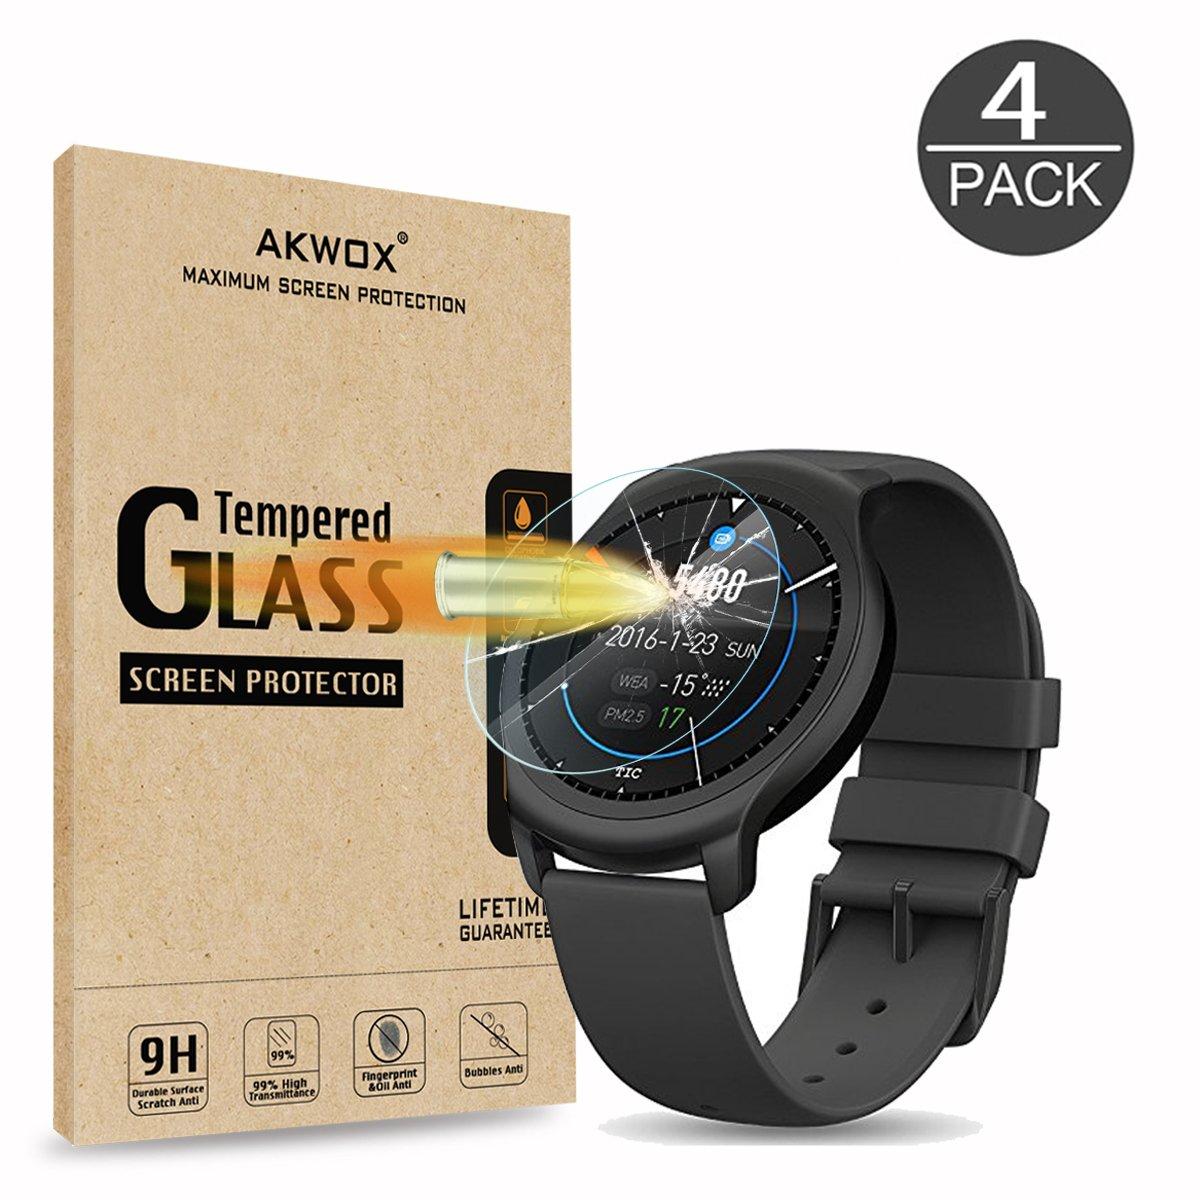 Vidrio Protector Para Ticwatch 2 X4 Akwox -799ctkkm